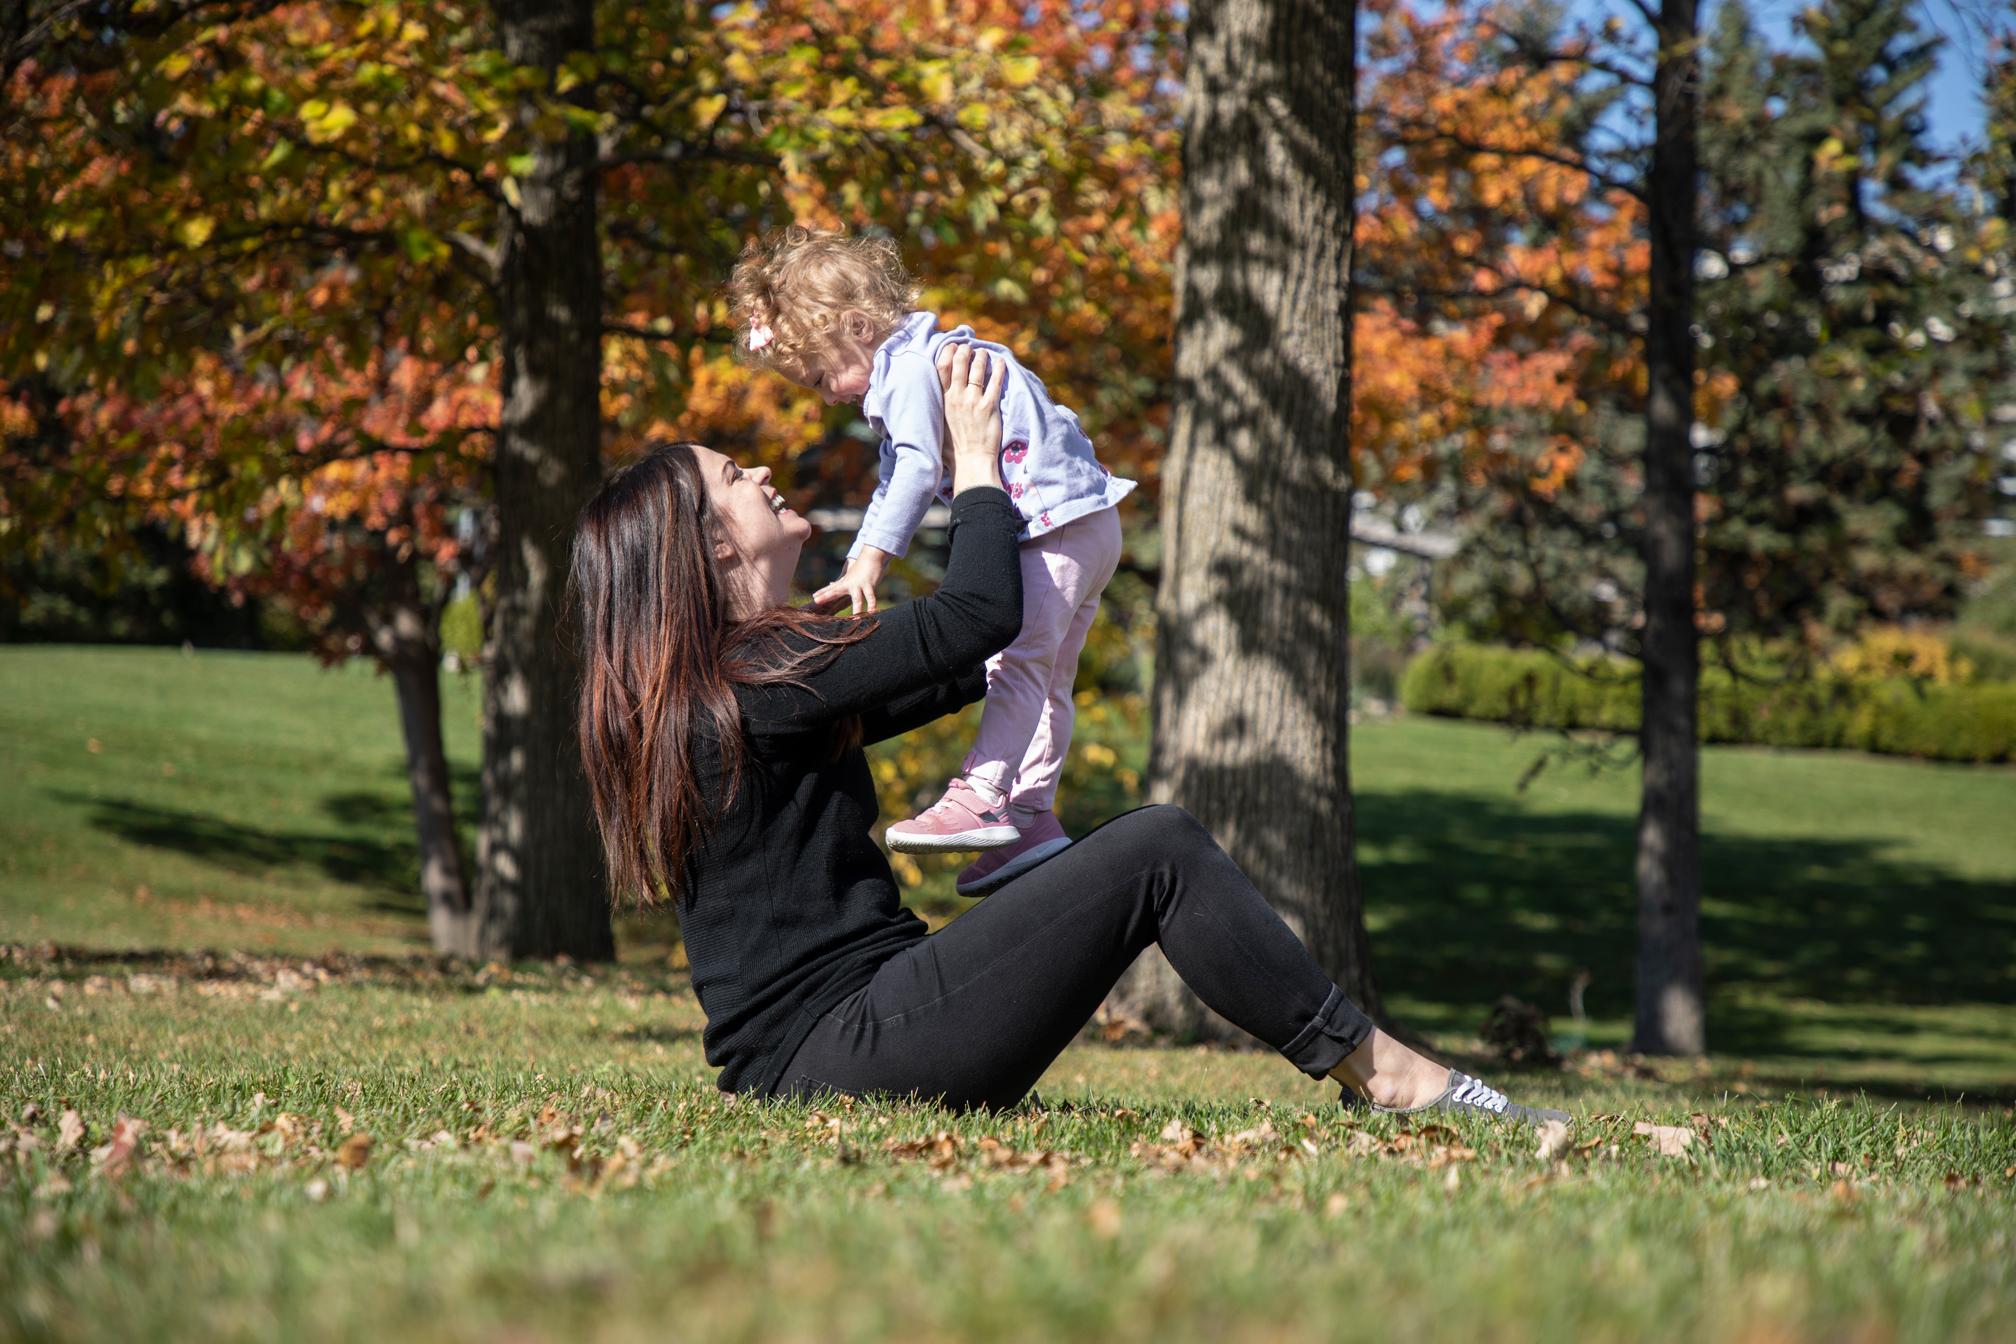 Jamie Eberts with her daughter, Olivia